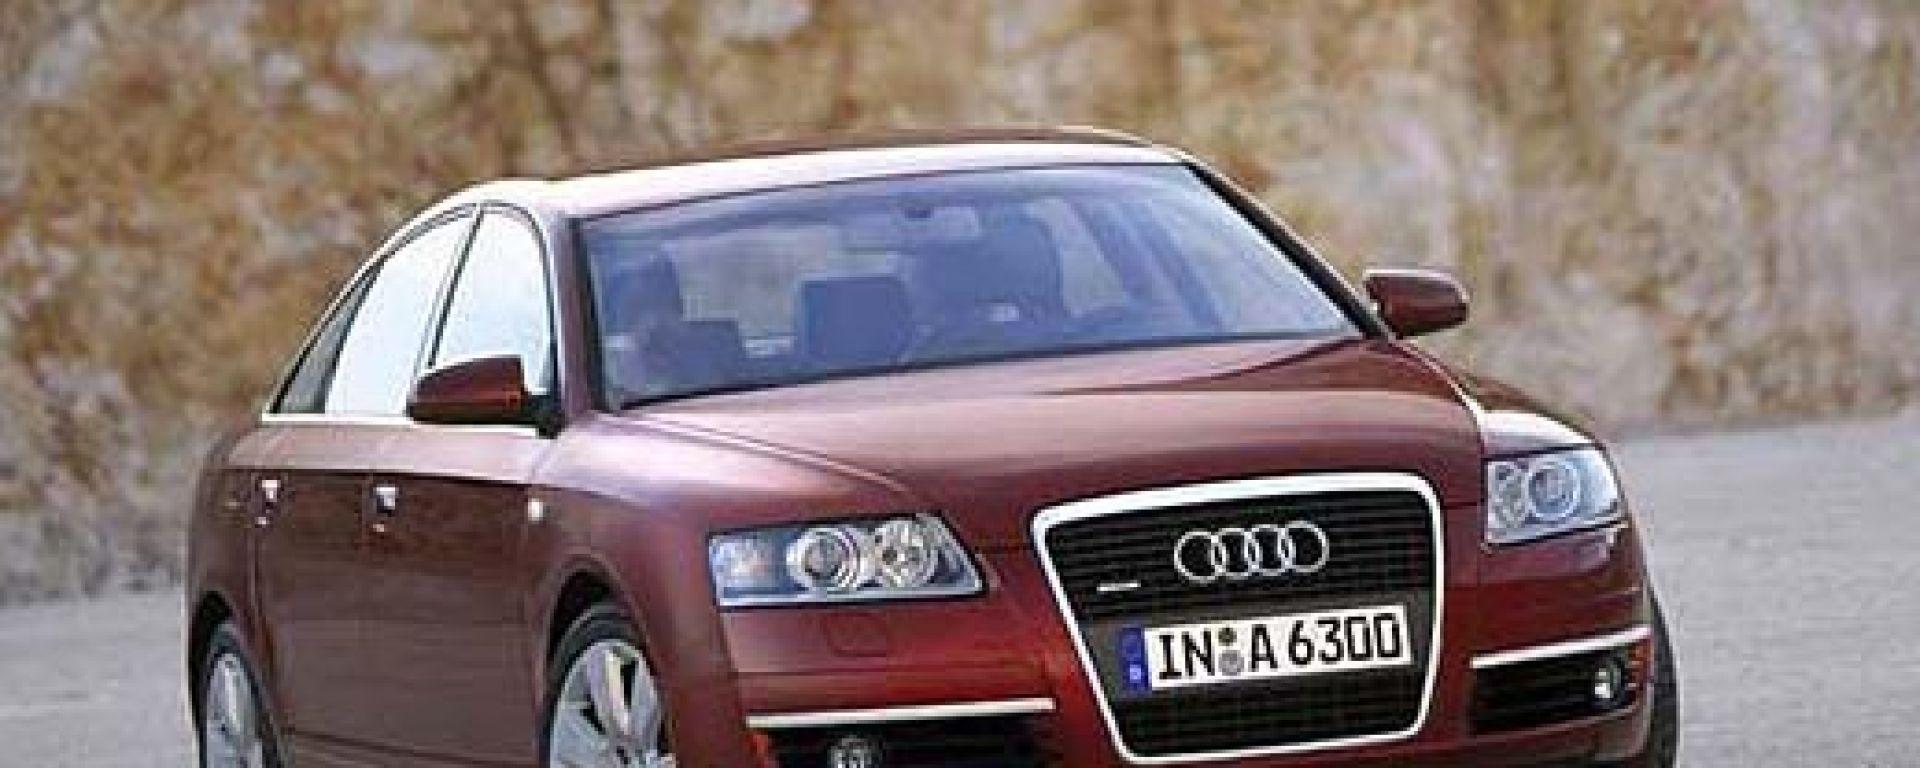 Anteprima: la nuova Audi A6